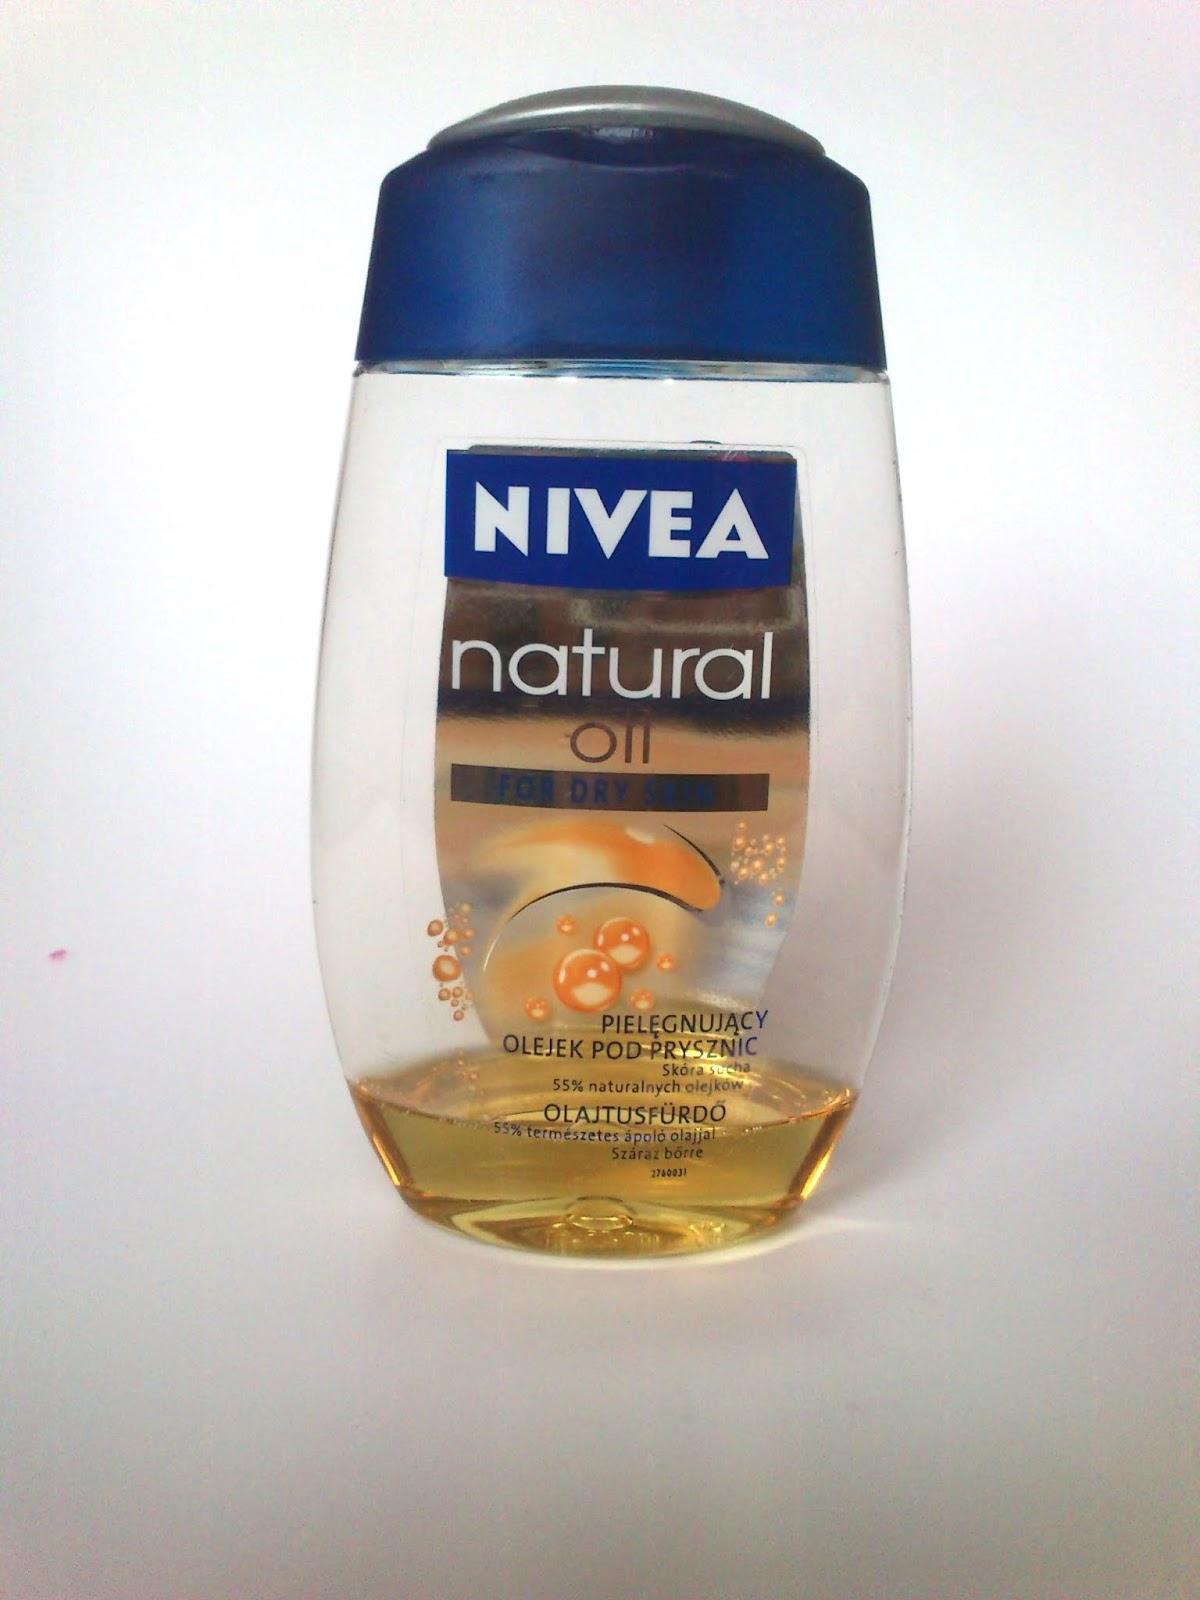 NIVEA NATURAL OIL ( pielęgnujący olejek pod prysznic )